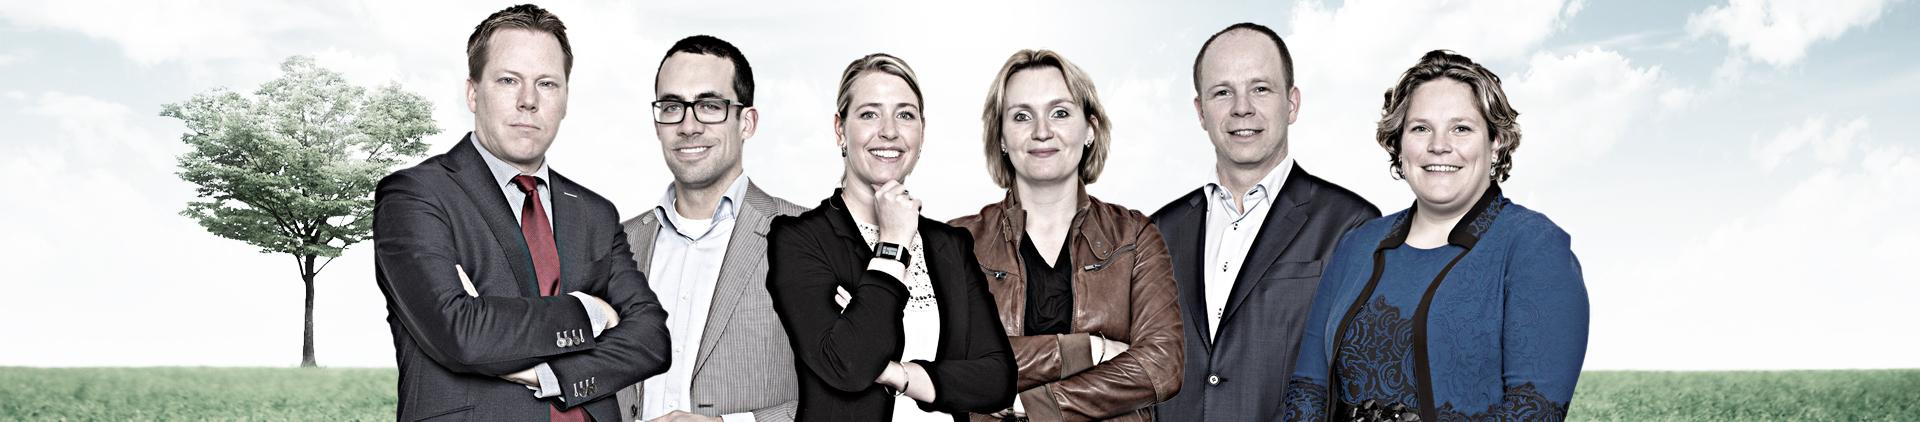 groepsportret bedrijfsportret portret Breda advocaten